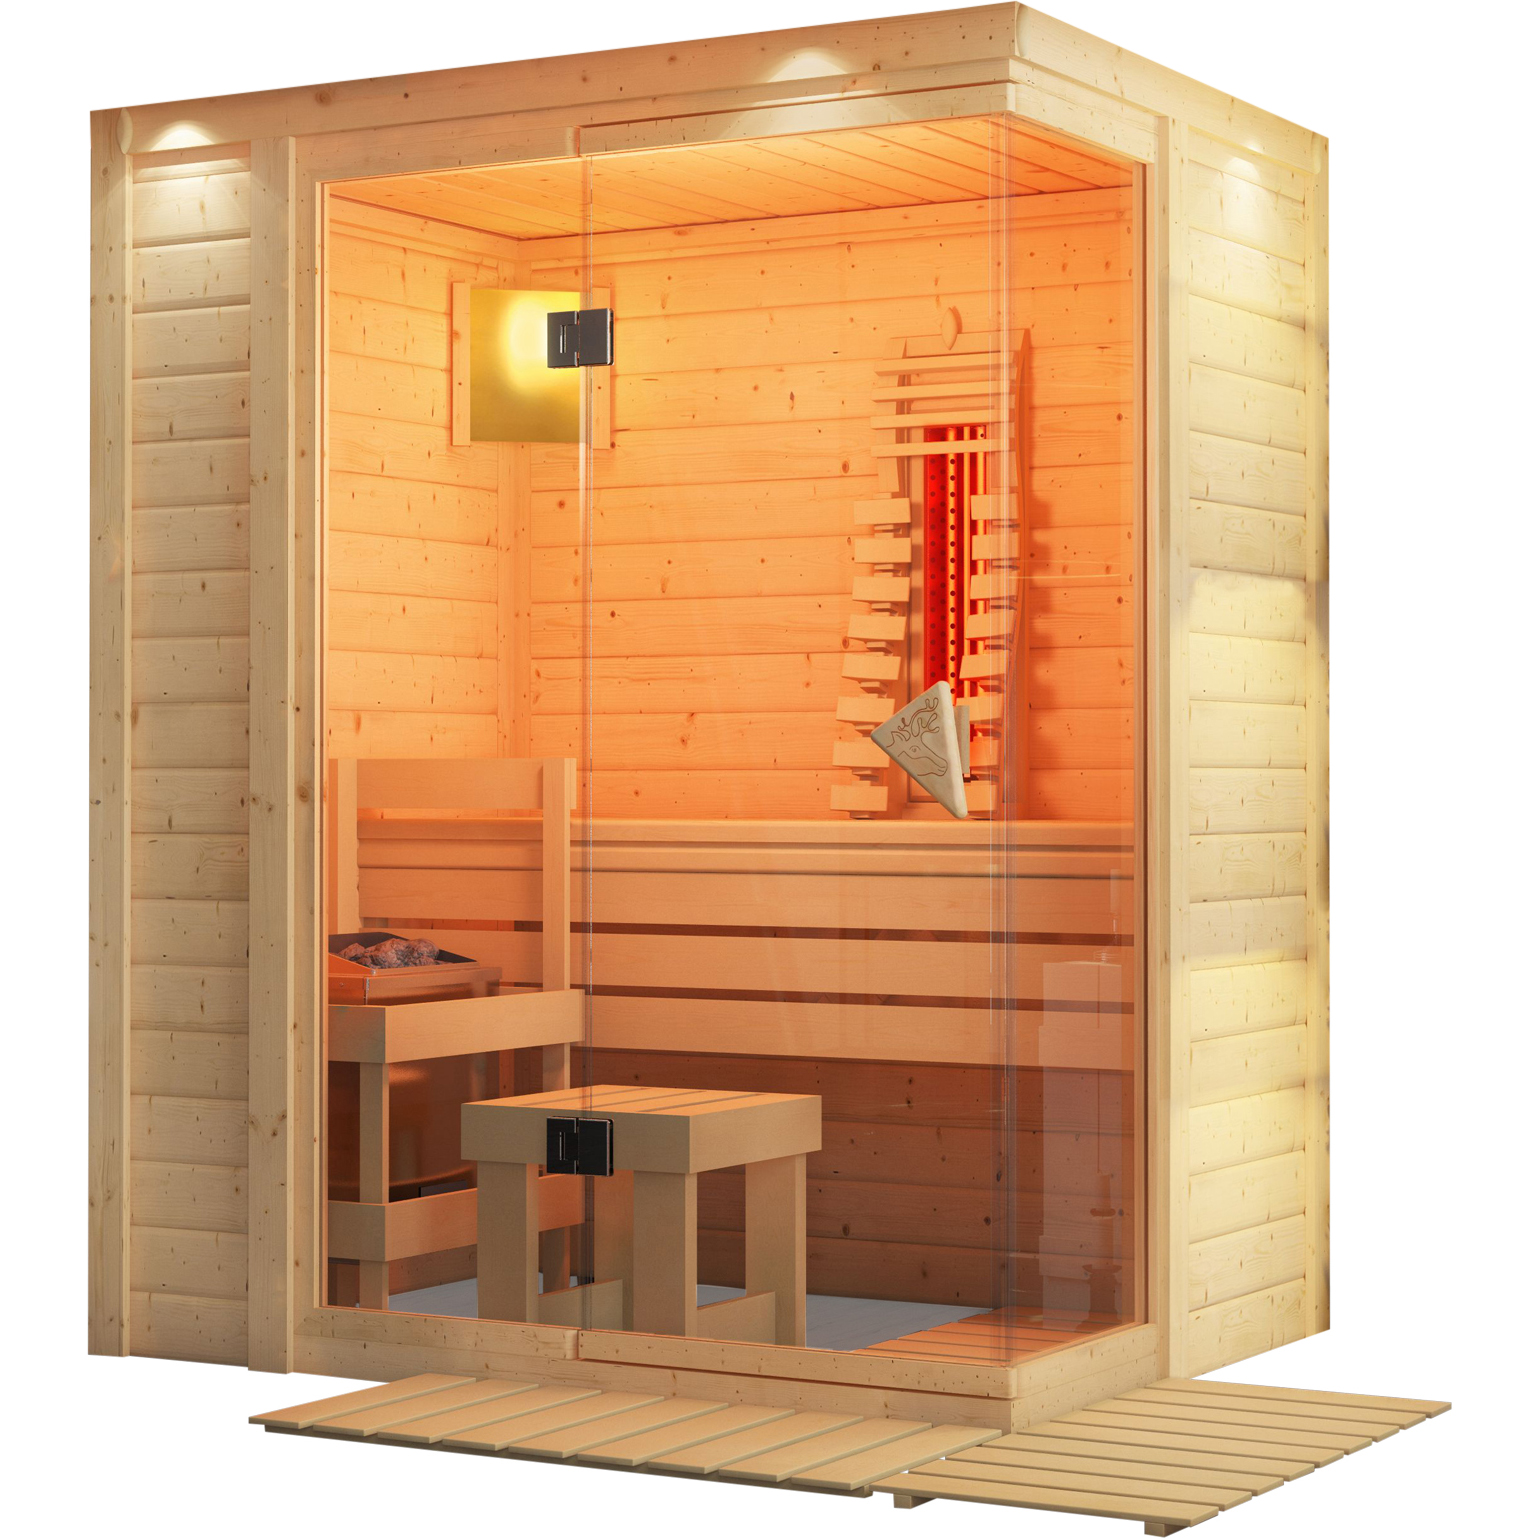 karibu massivholzsauna flurina 1 73 x 1 27 m 40 mm mit 9 kw ofen sauna heimsauna ebay. Black Bedroom Furniture Sets. Home Design Ideas